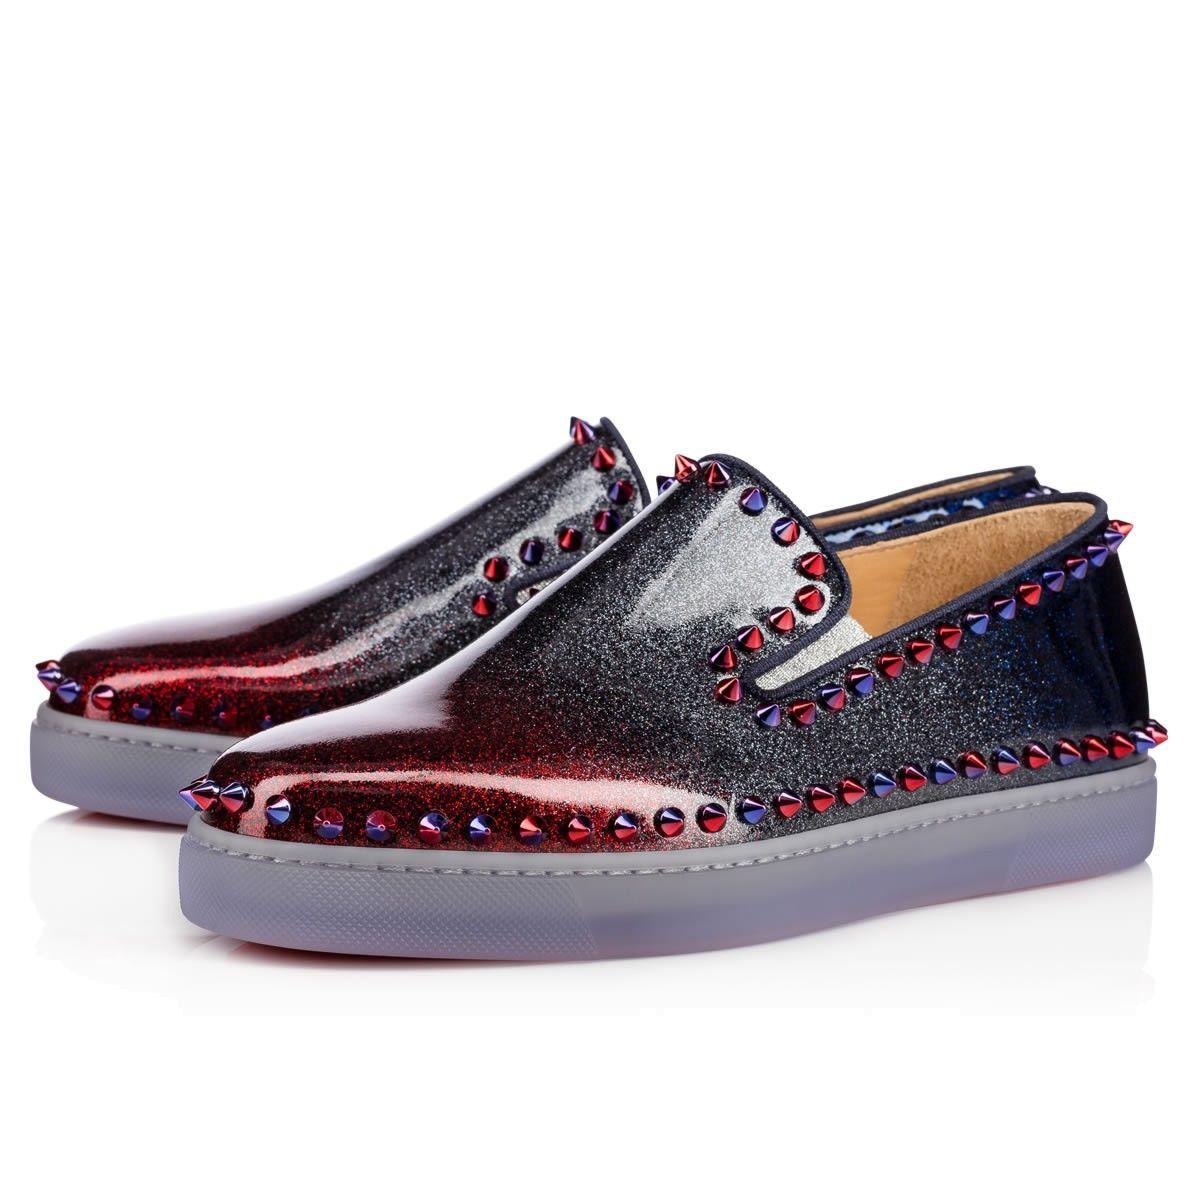 07a03043d73 Women Shoes - Pik Boat Woman Flat Patent Univers/gg - Christian ...